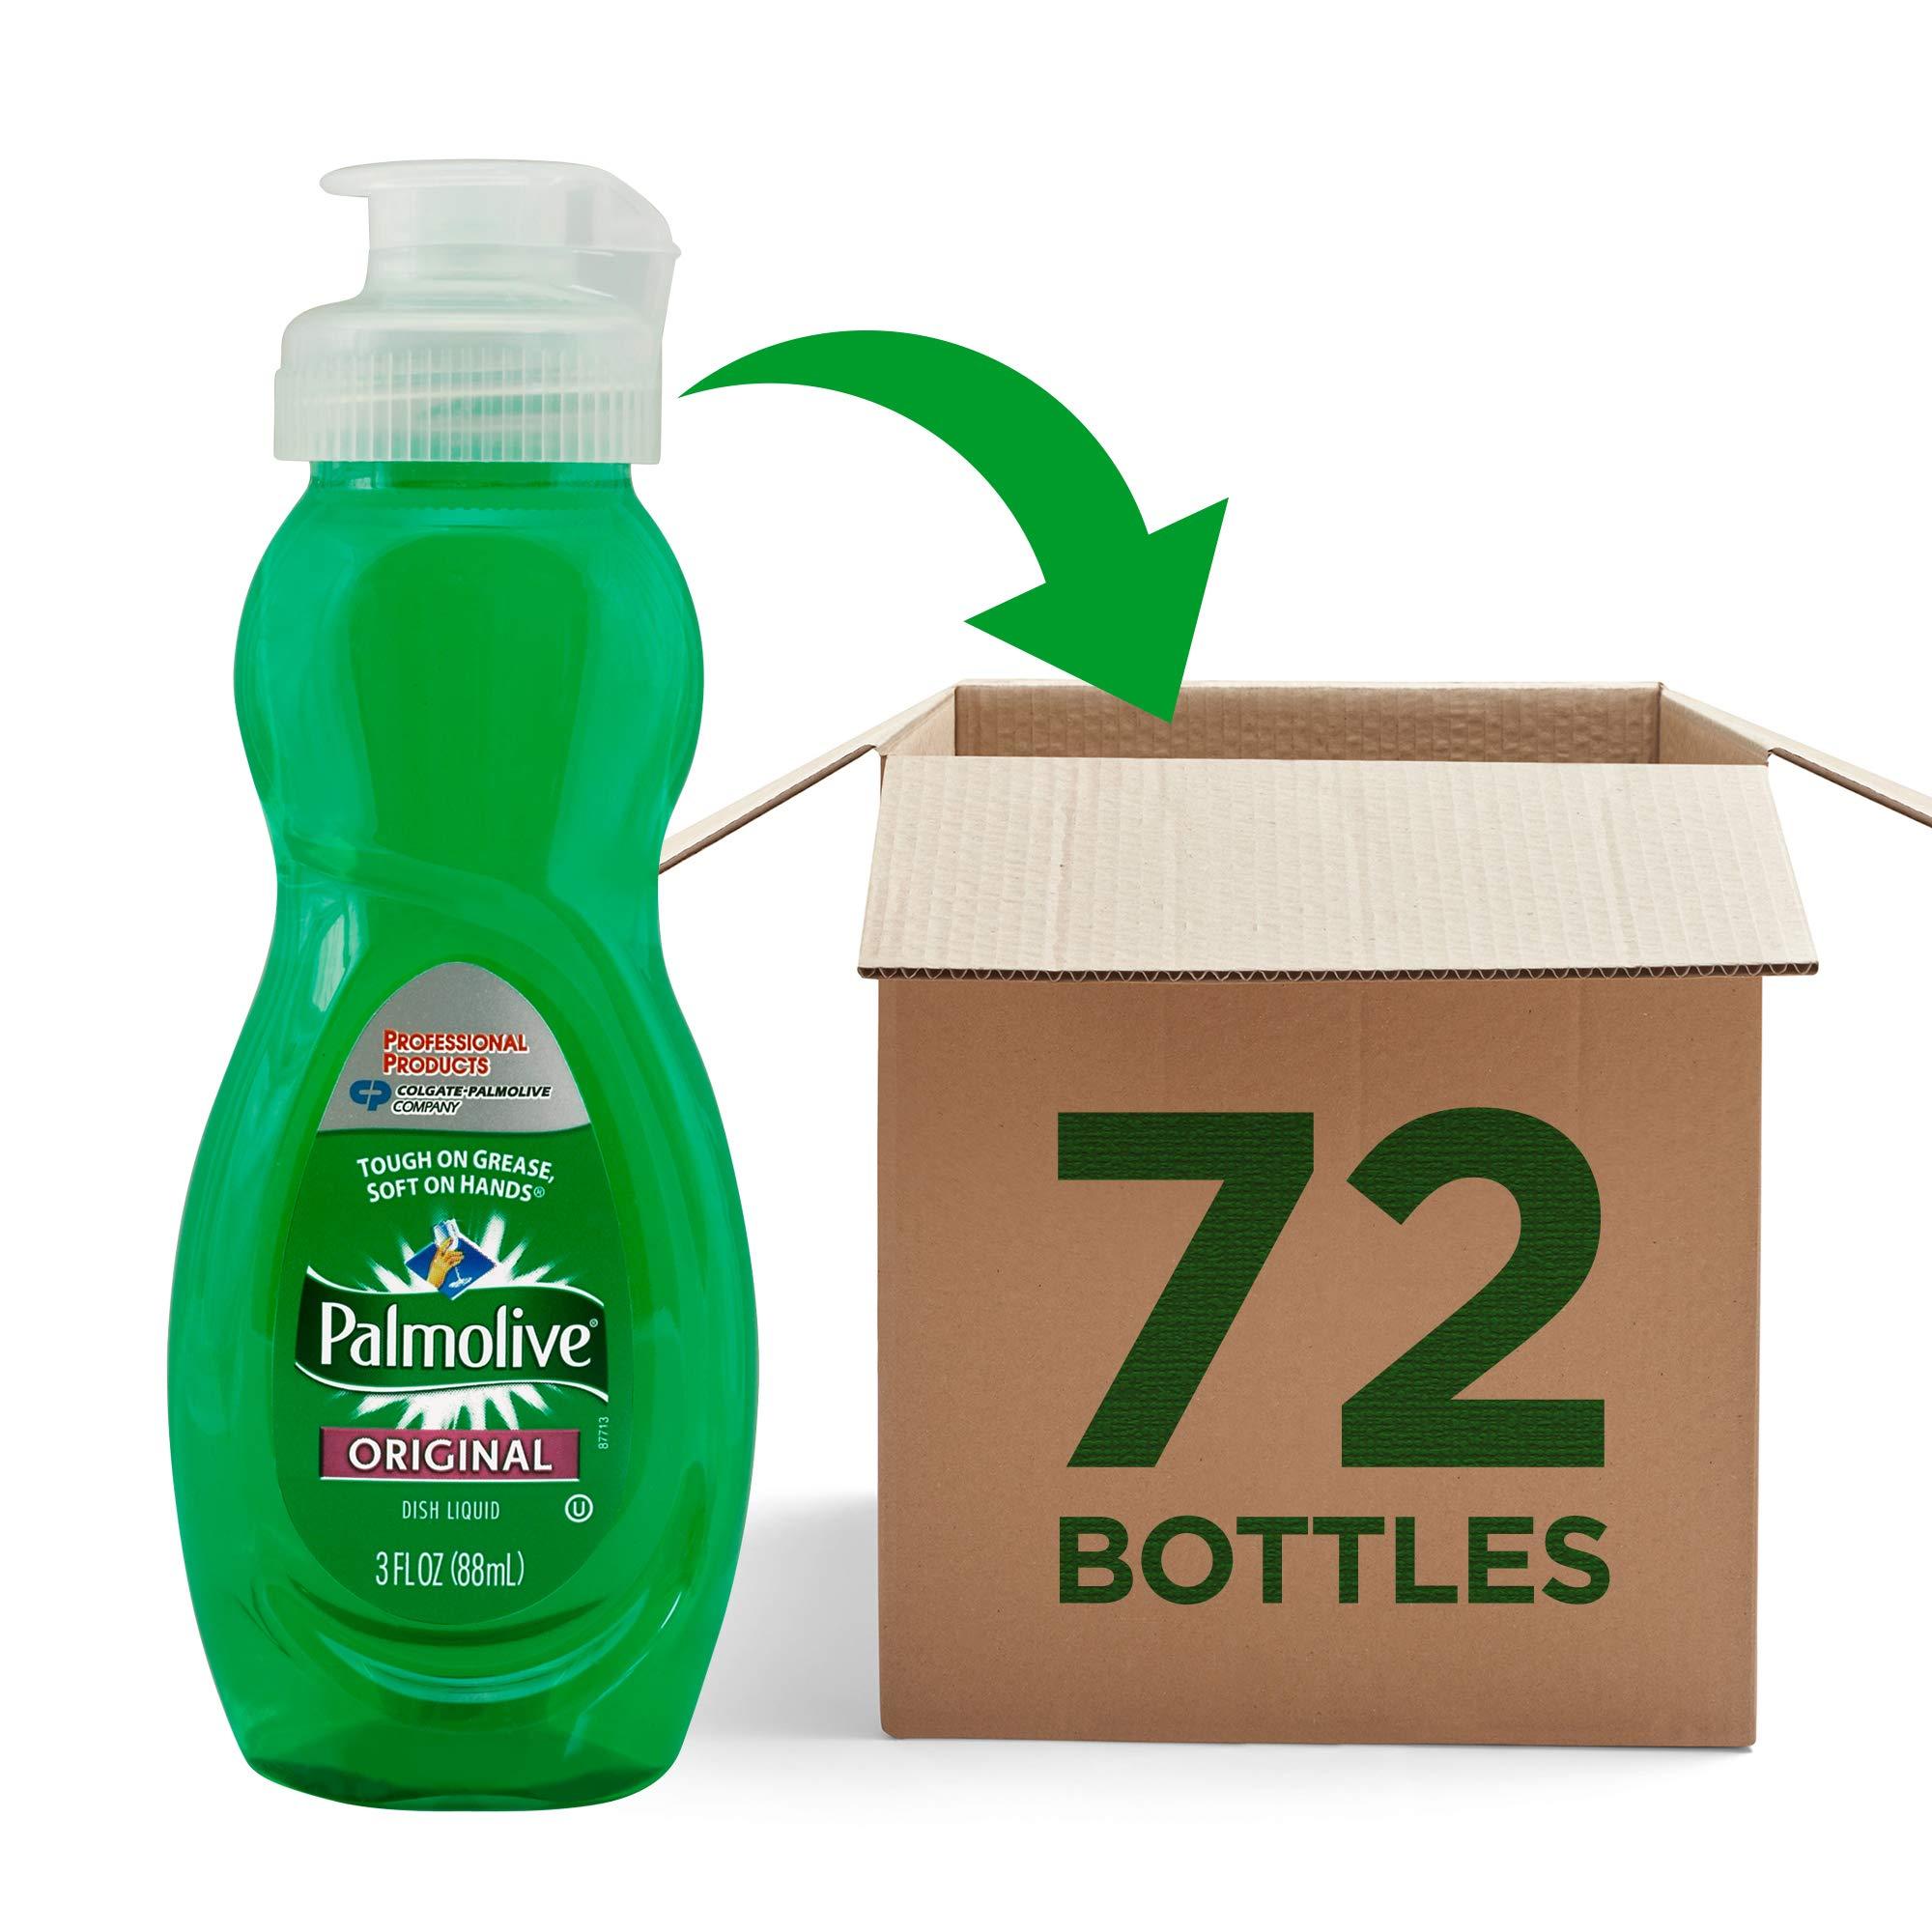 PALMOLIVE Dishwashing Liquid, Dish Soap, Dish Liquid Soap, Phosphate Free, pH Balanced, Dishwasher Cleaner, 3 Ounce Bottle (Case of 72) (201417) by Palmolive